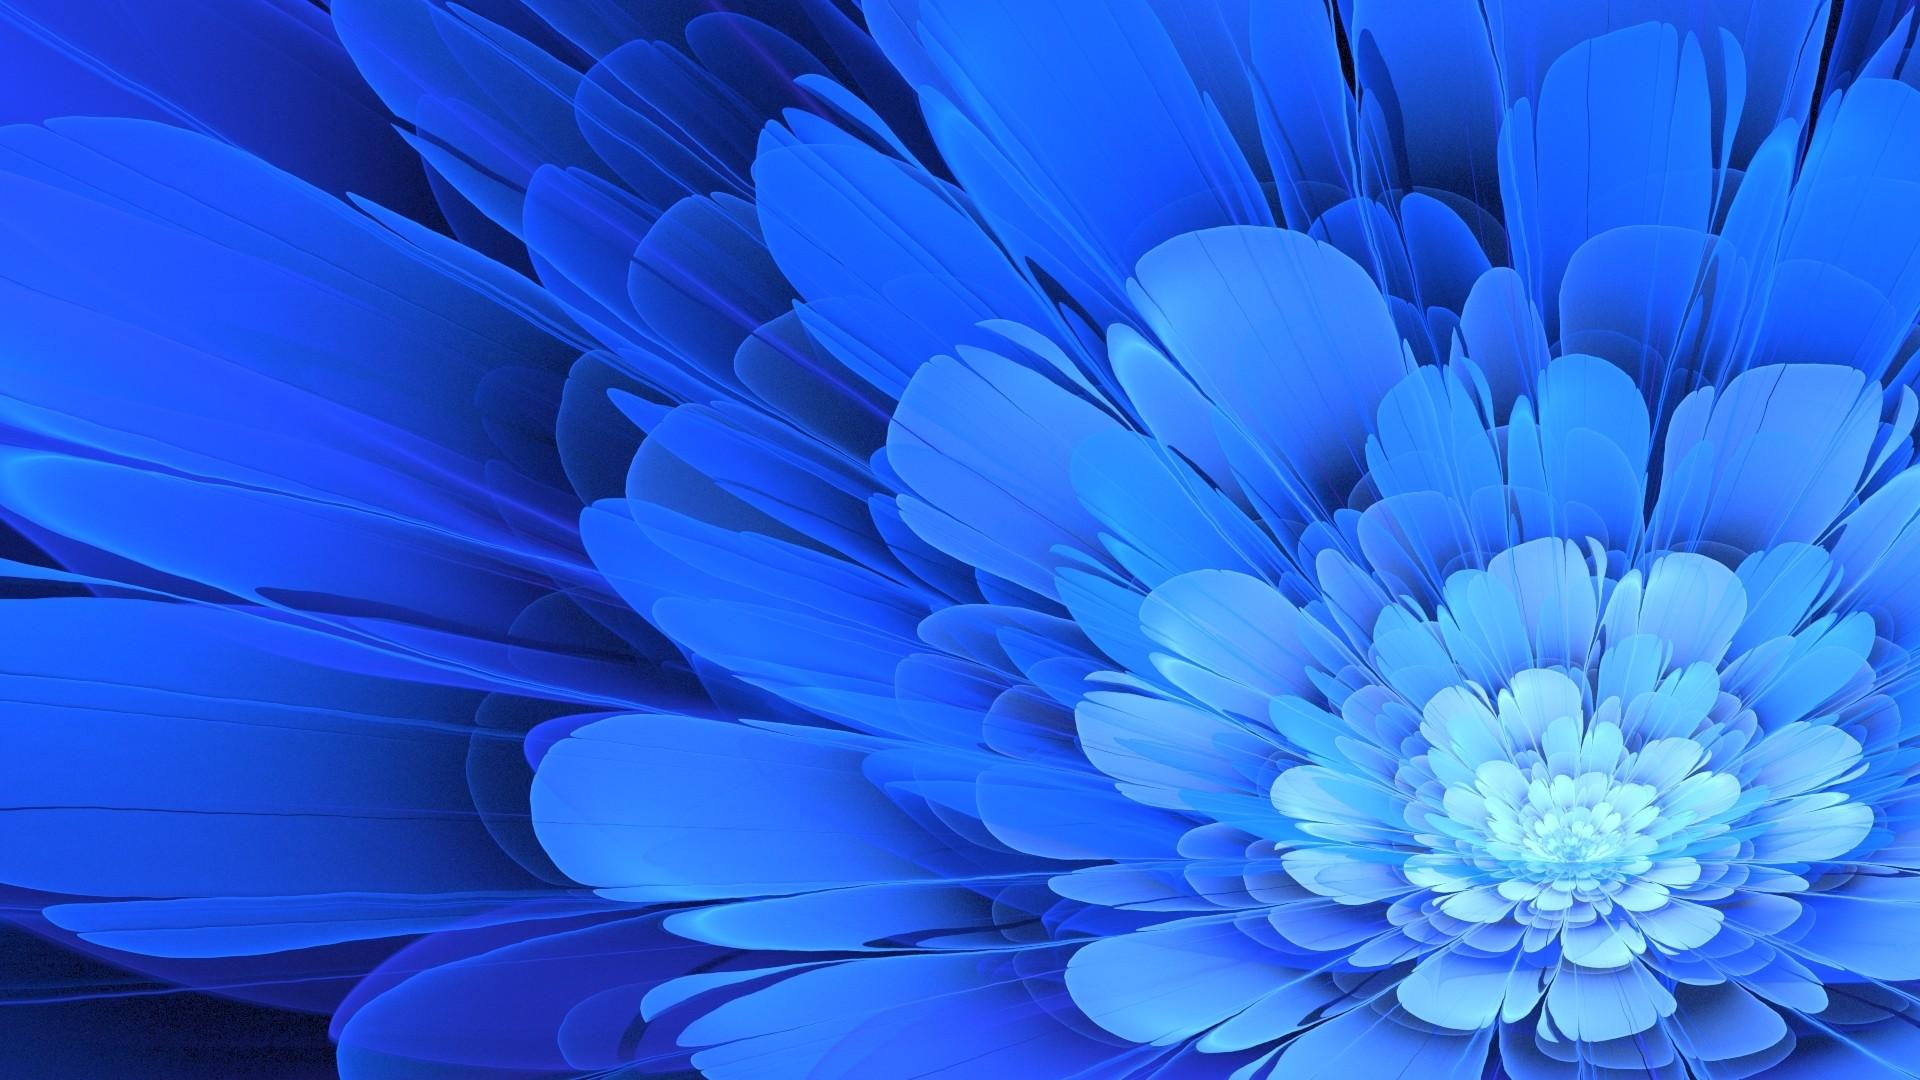 Blue Flower hd desktop wallpaper